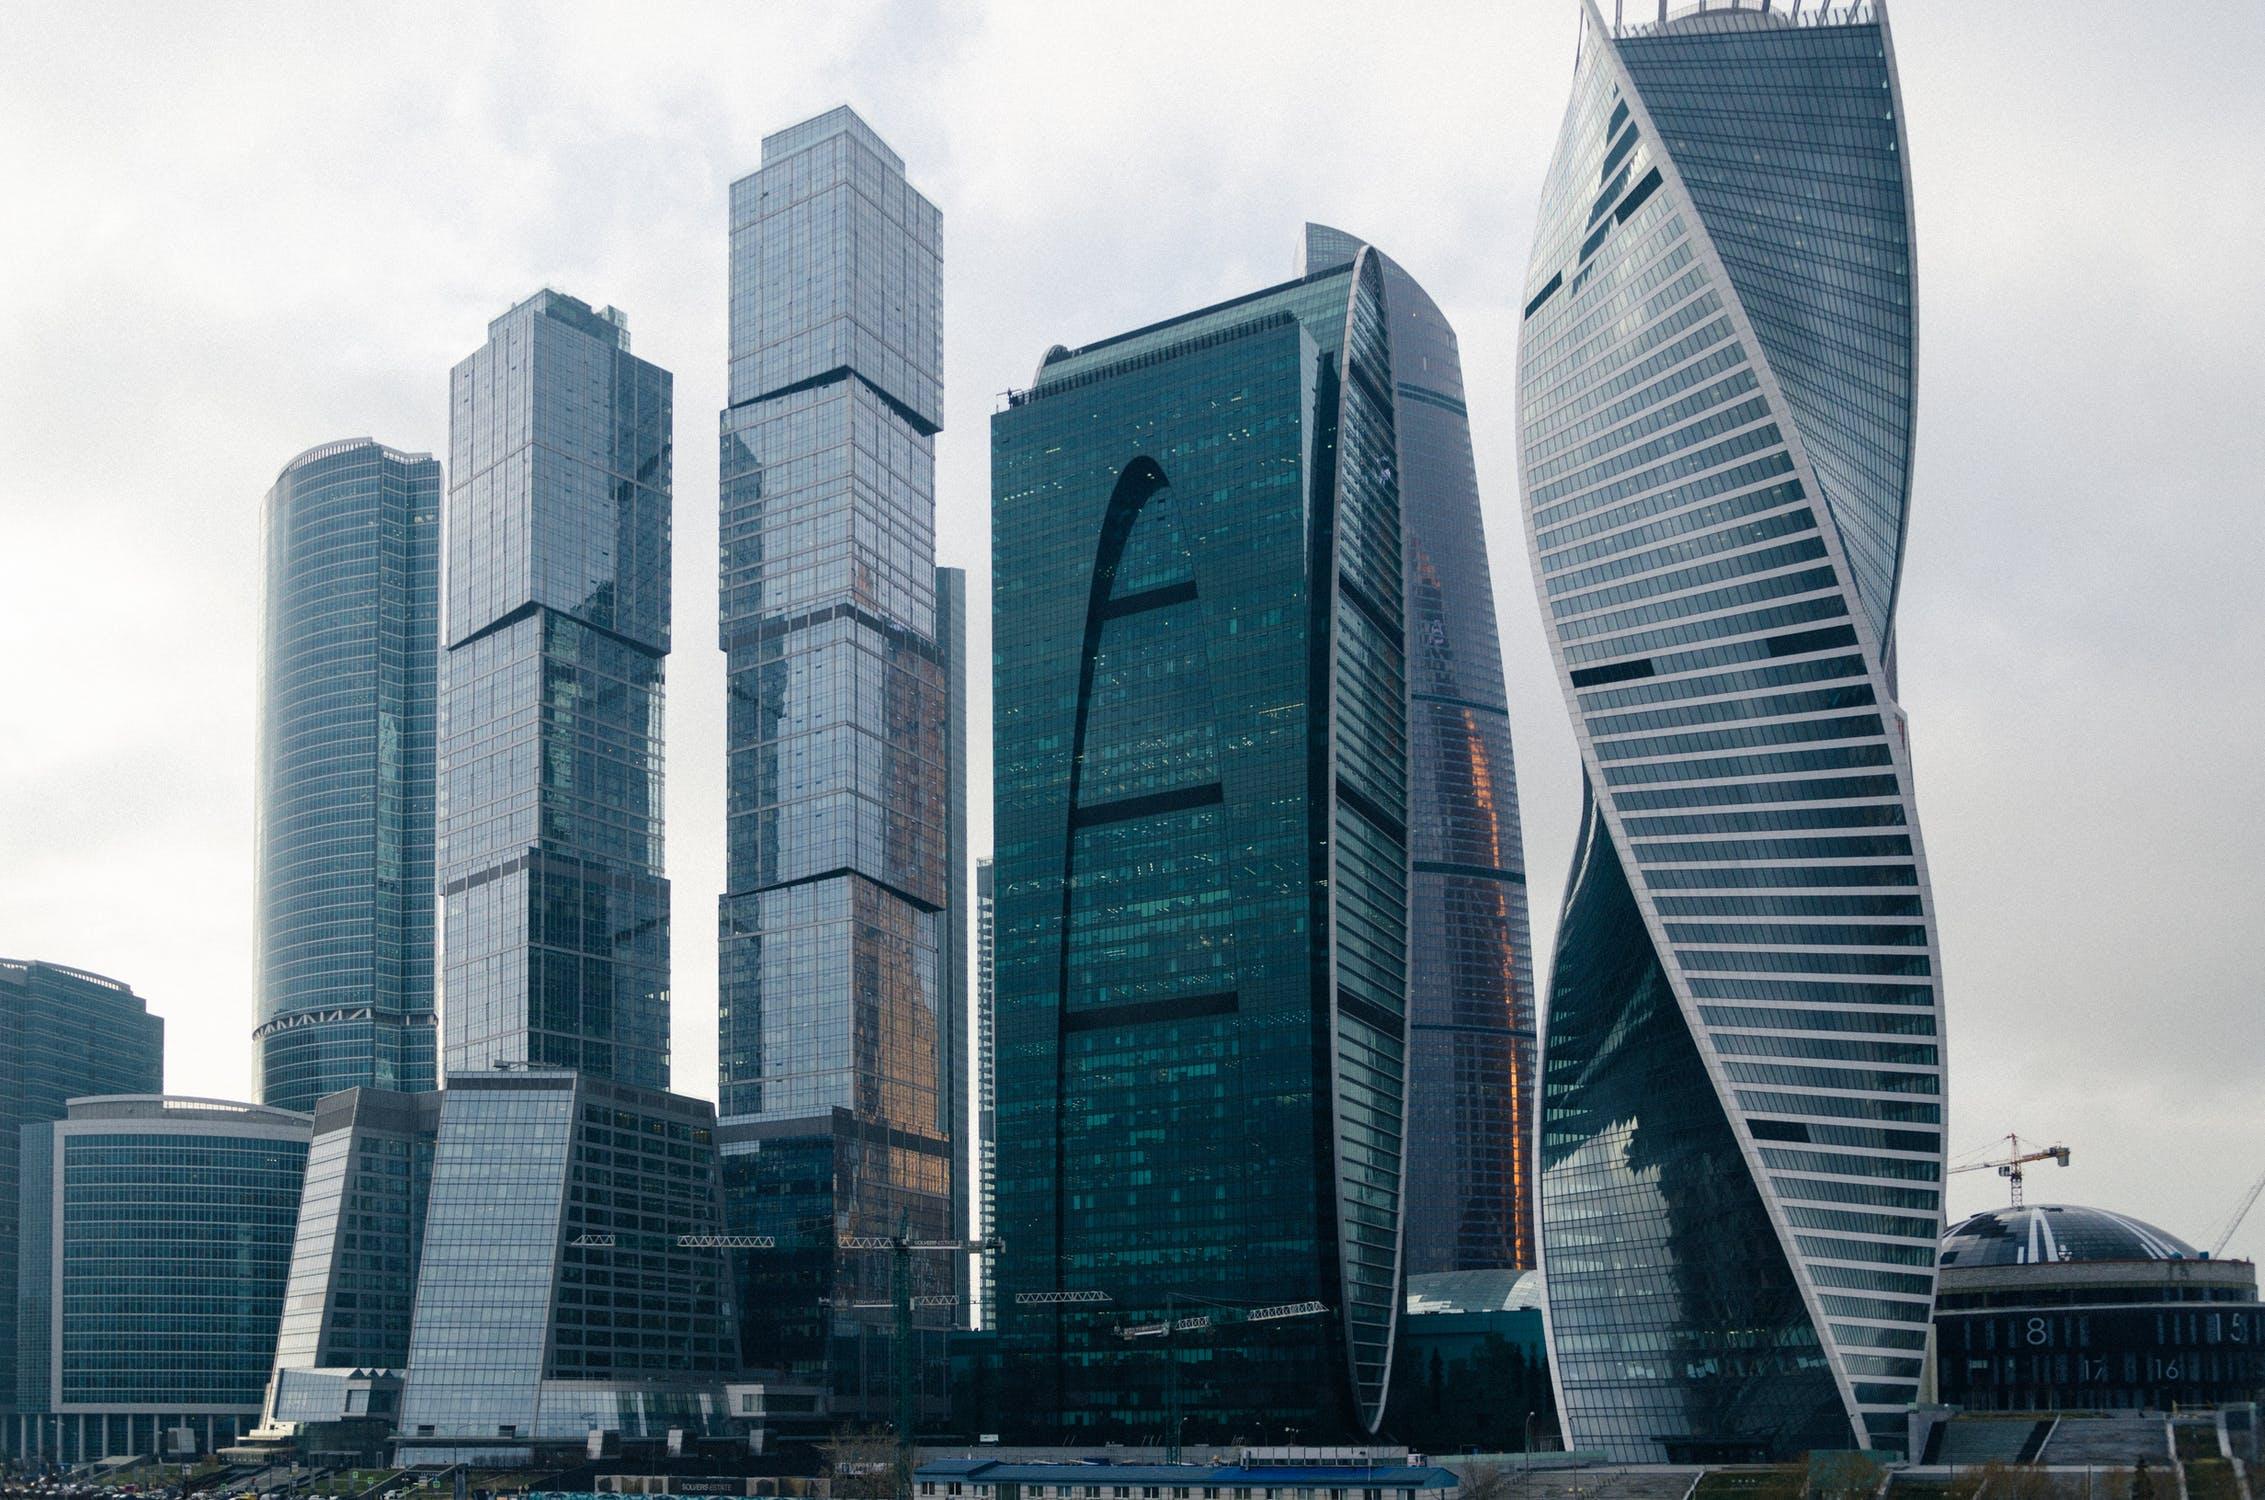 MY.GAMES: Российский рынок видеоигр за 2019 игр заработал 120,4 млрд рублей ($1,8 млрд)